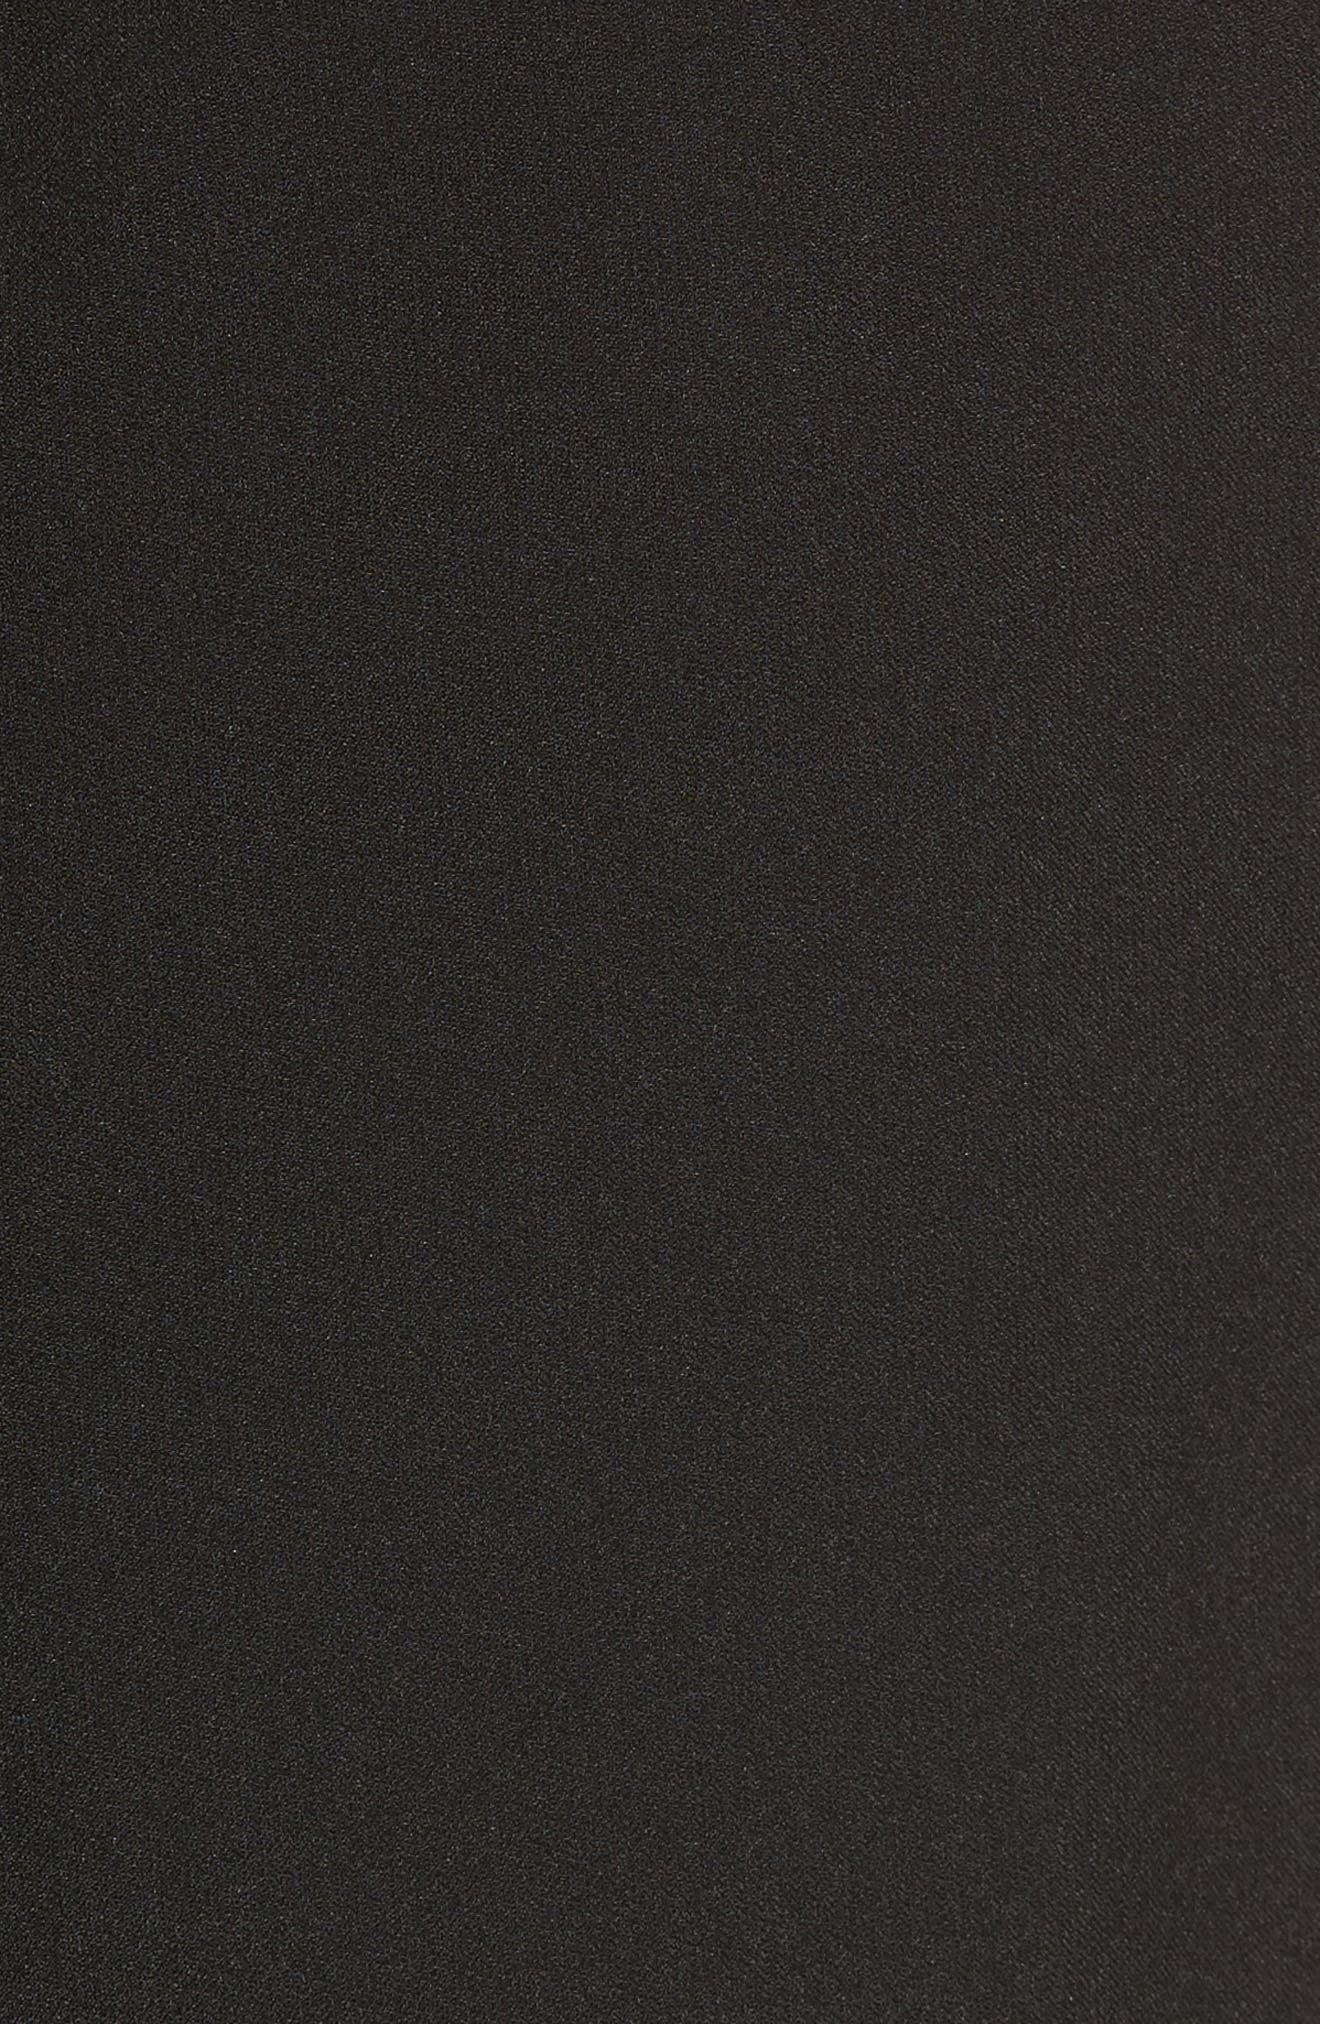 New York Crepe Button Back Top,                             Alternate thumbnail 5, color,                             Black